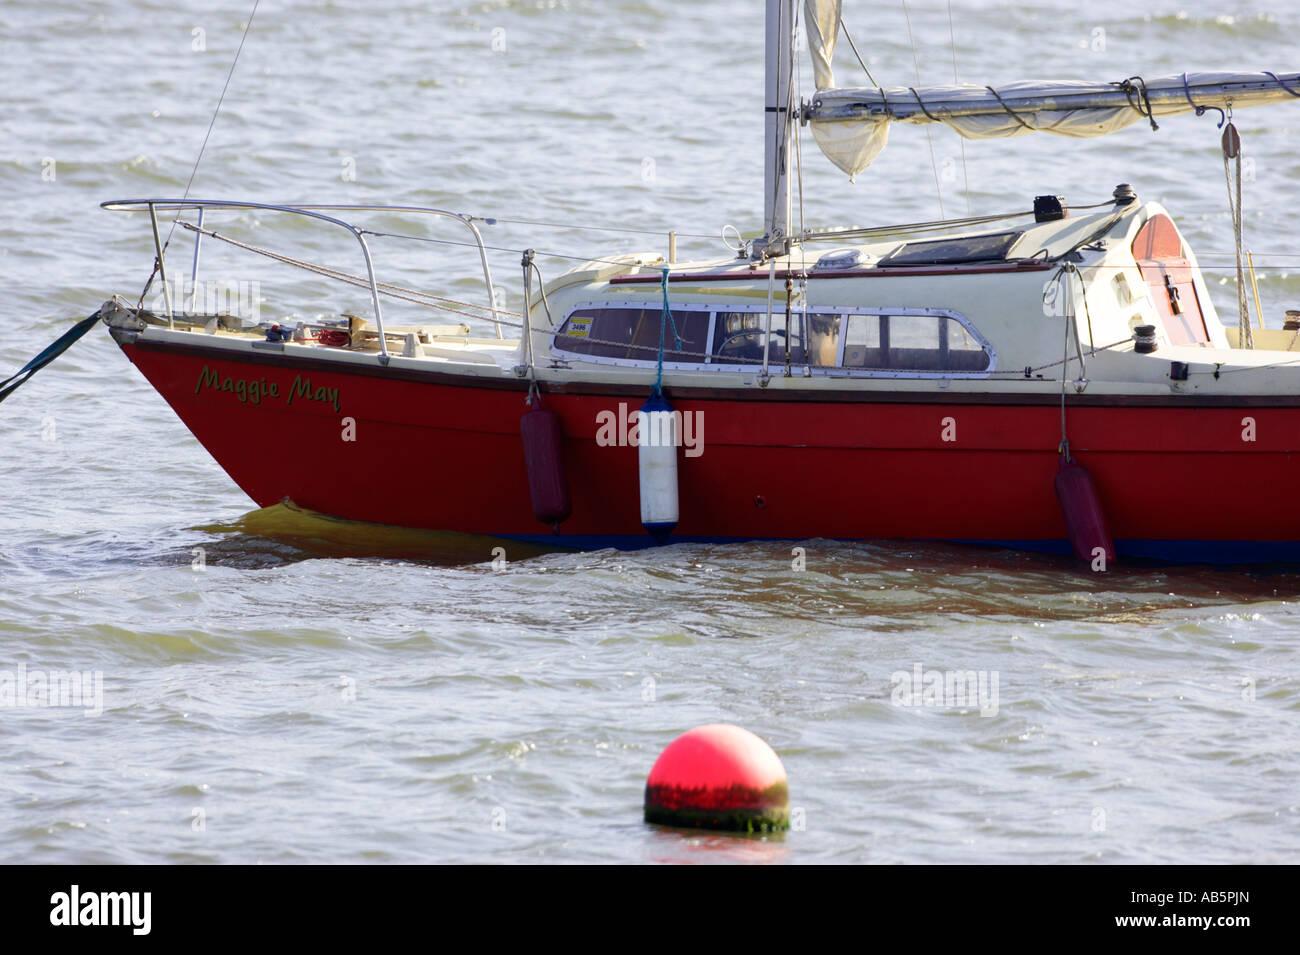 small yacht sailboat tied up at berth in carlingford lough - Stock Image